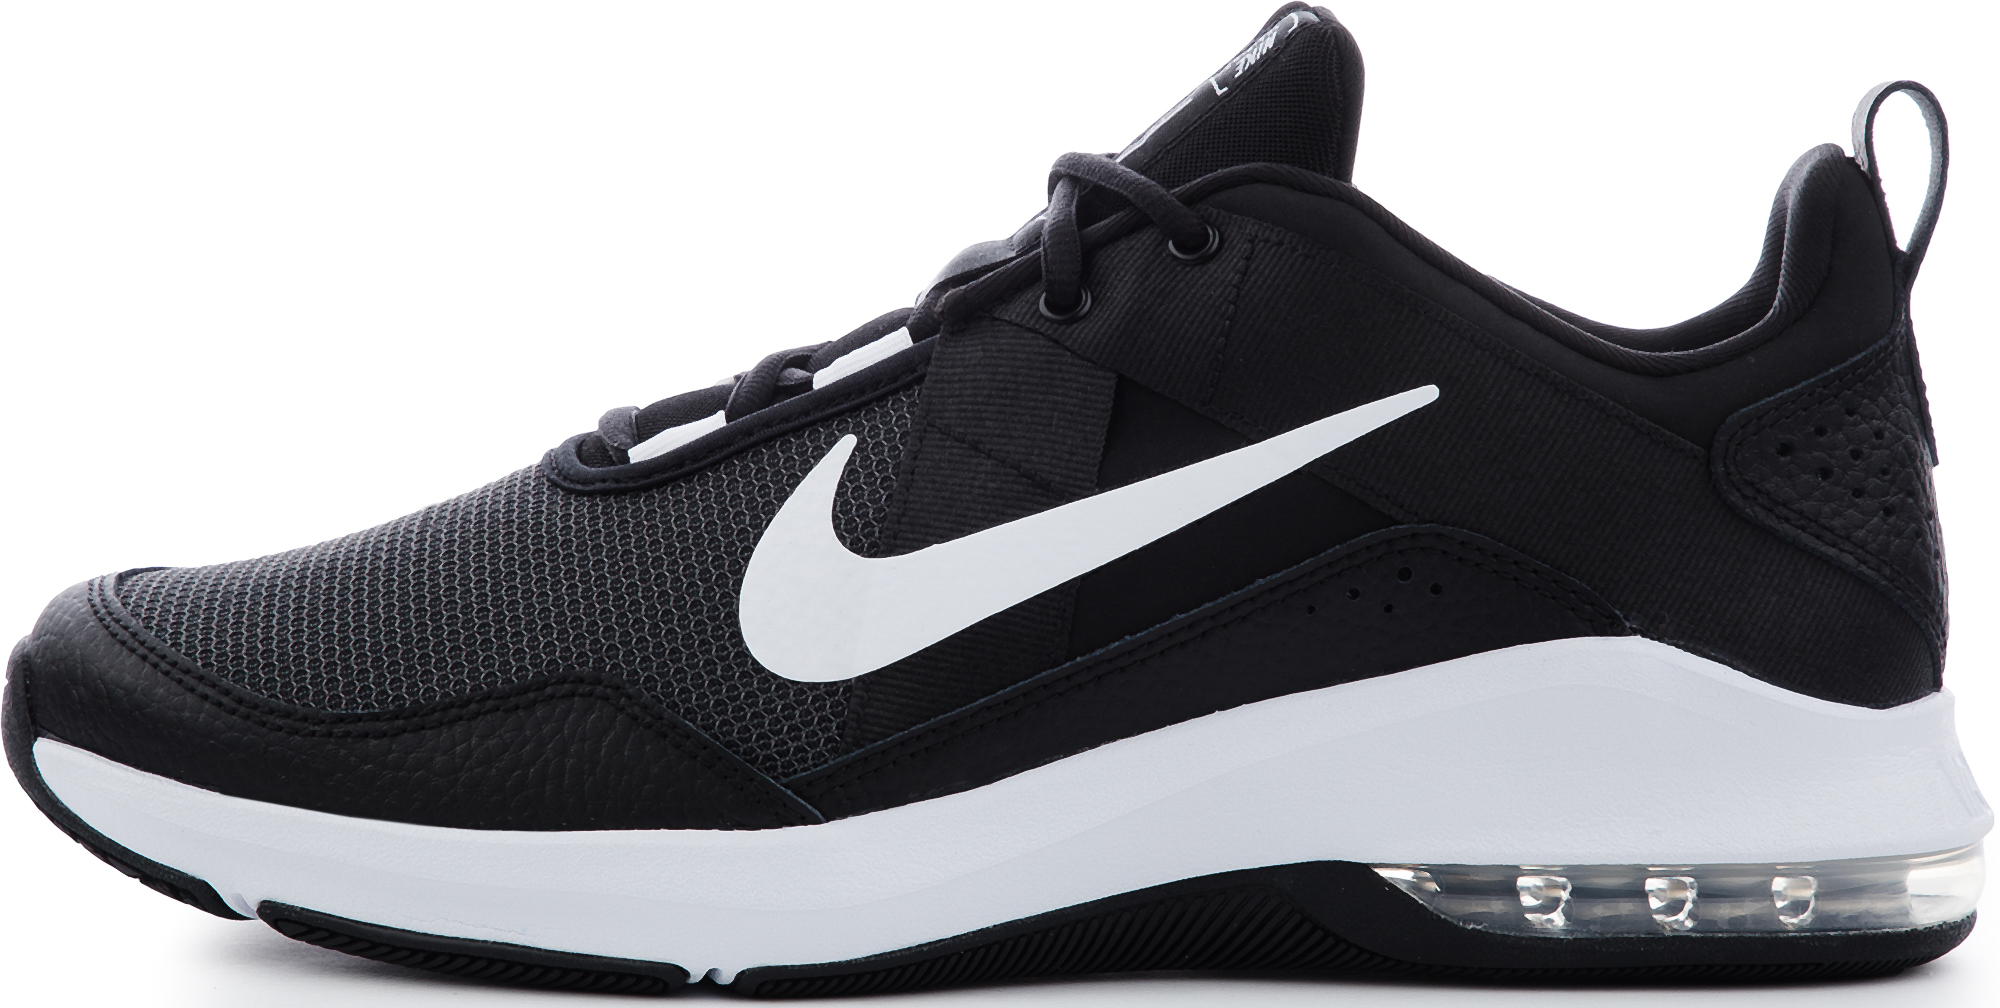 Фото - Nike Кроссовки мужские Nike Air Max Alpha, размер 45 кроссовки мужские твое цвет белый a4390 размер 45